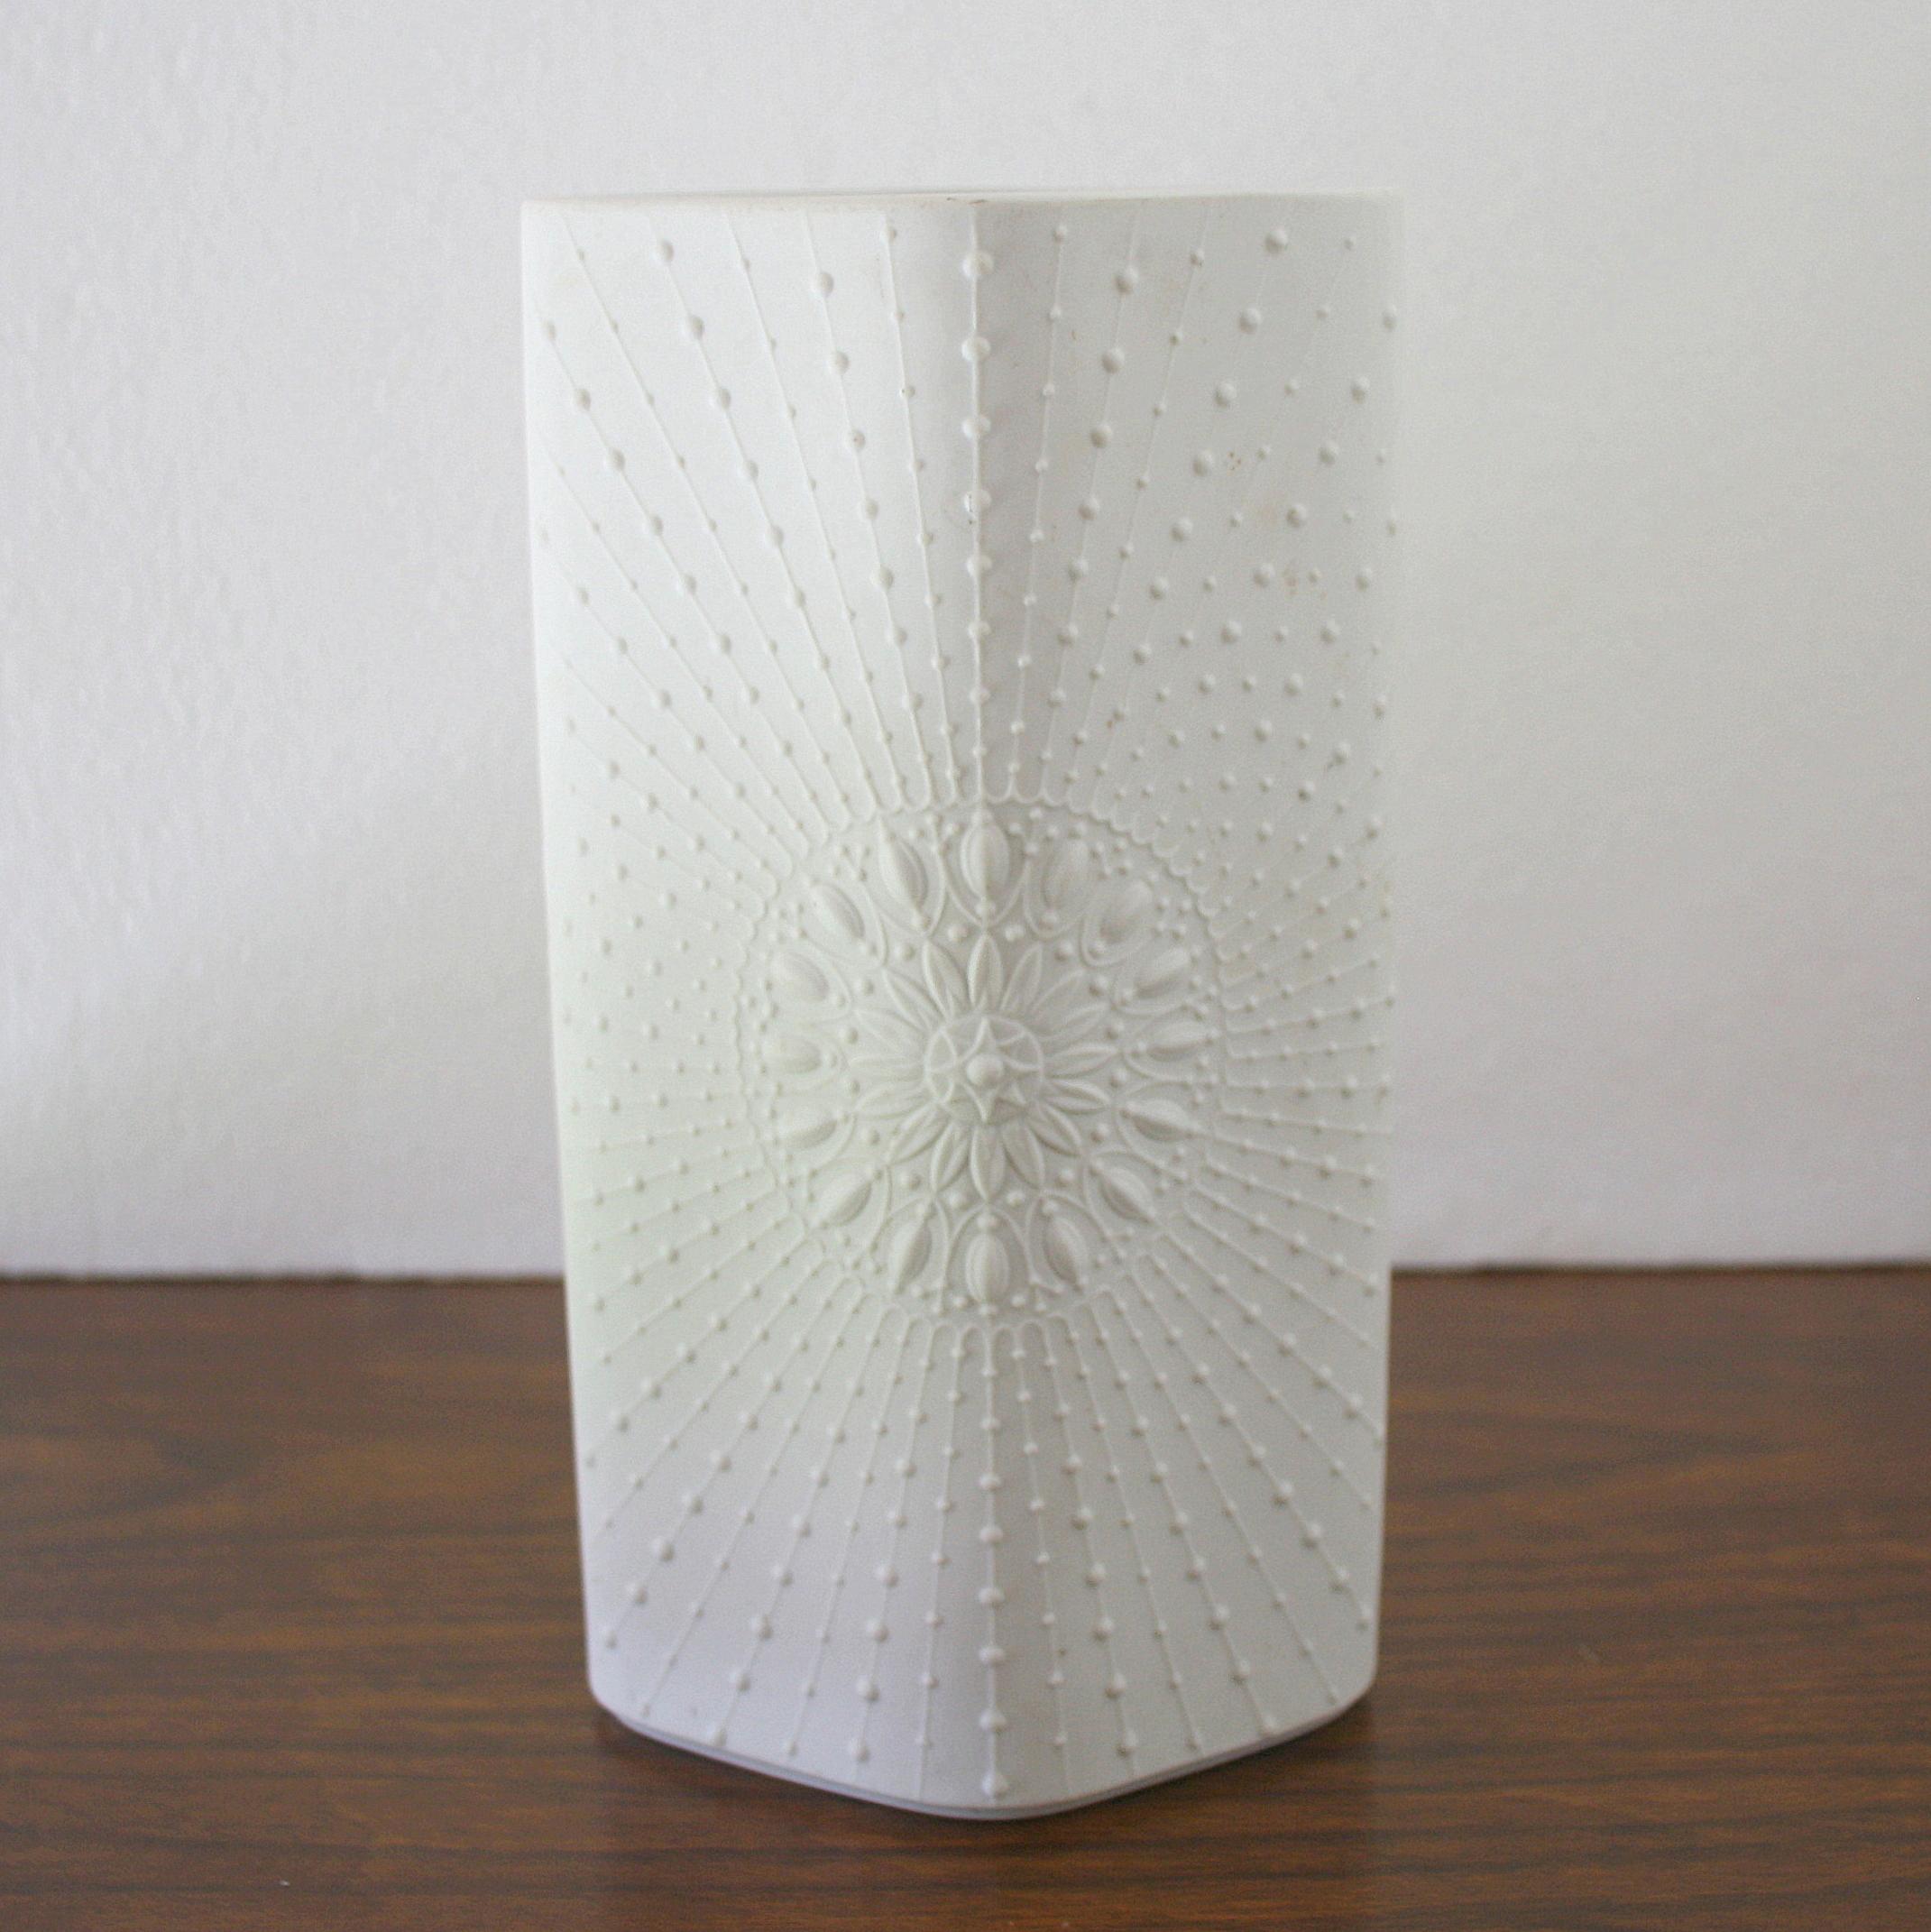 Krautheim Rosetta sunburst vase 1